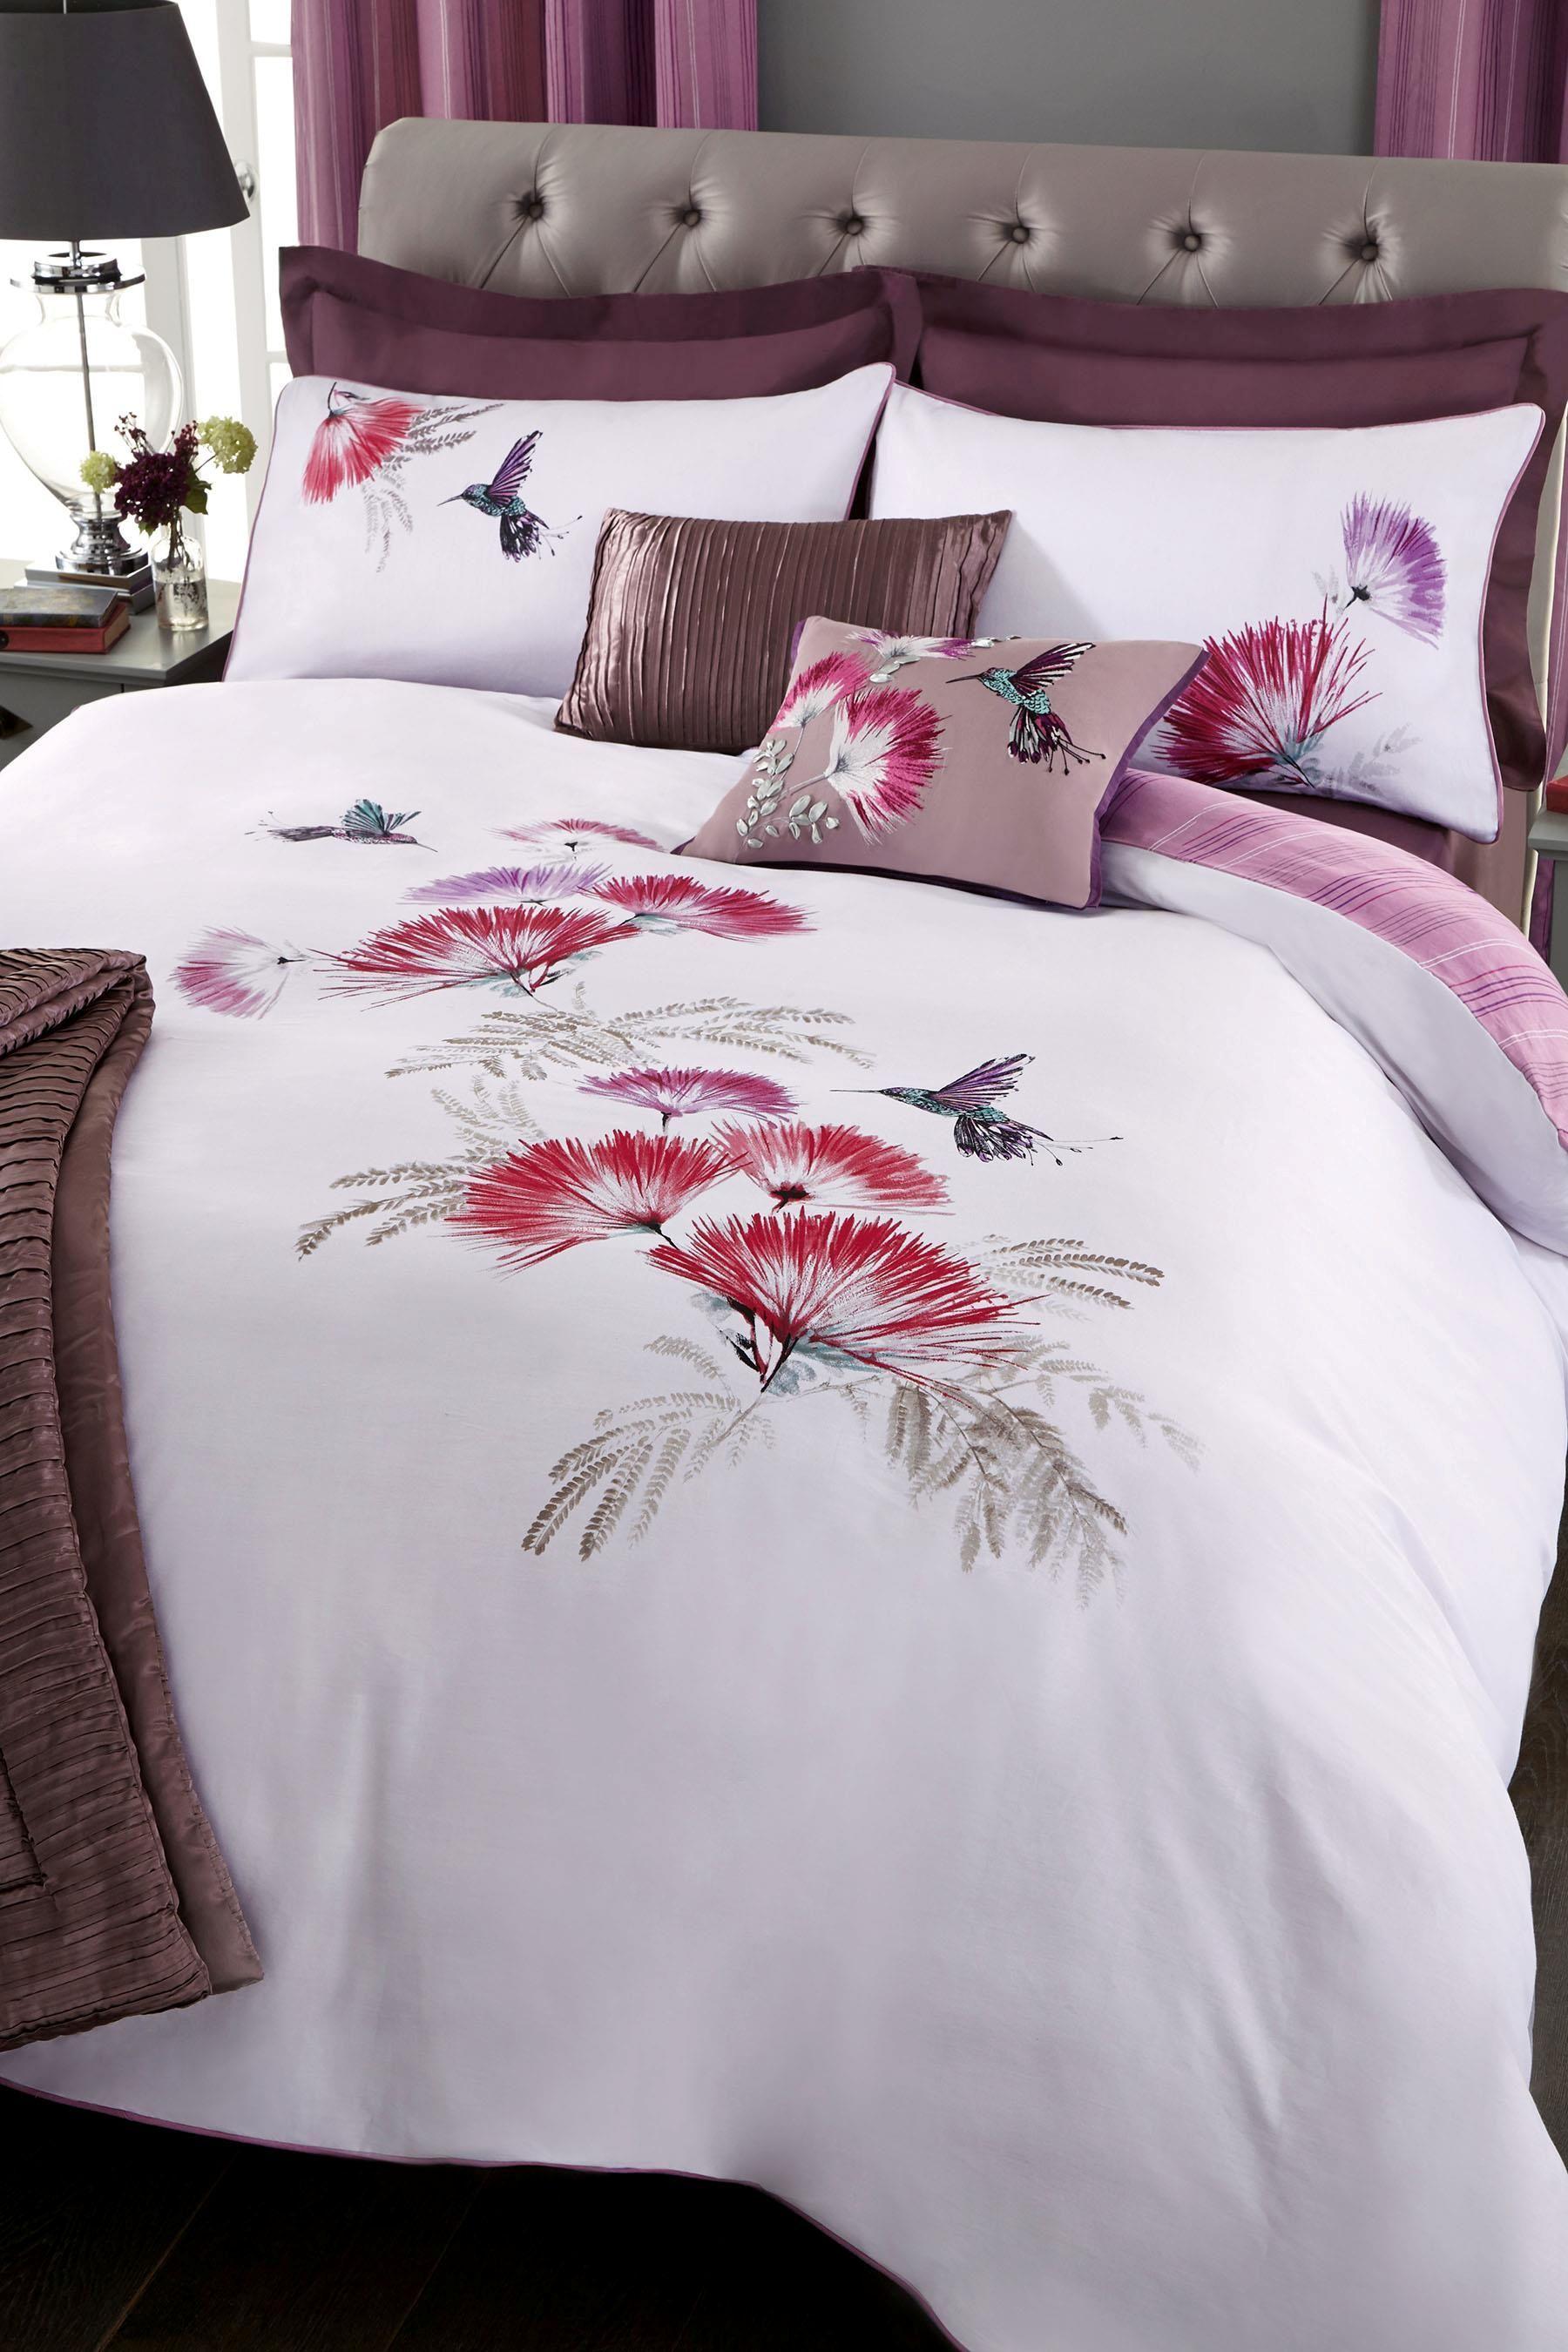 Buy Mauve Hummingbird Cotton Sateen Bed Set online today at Next: New Zealand